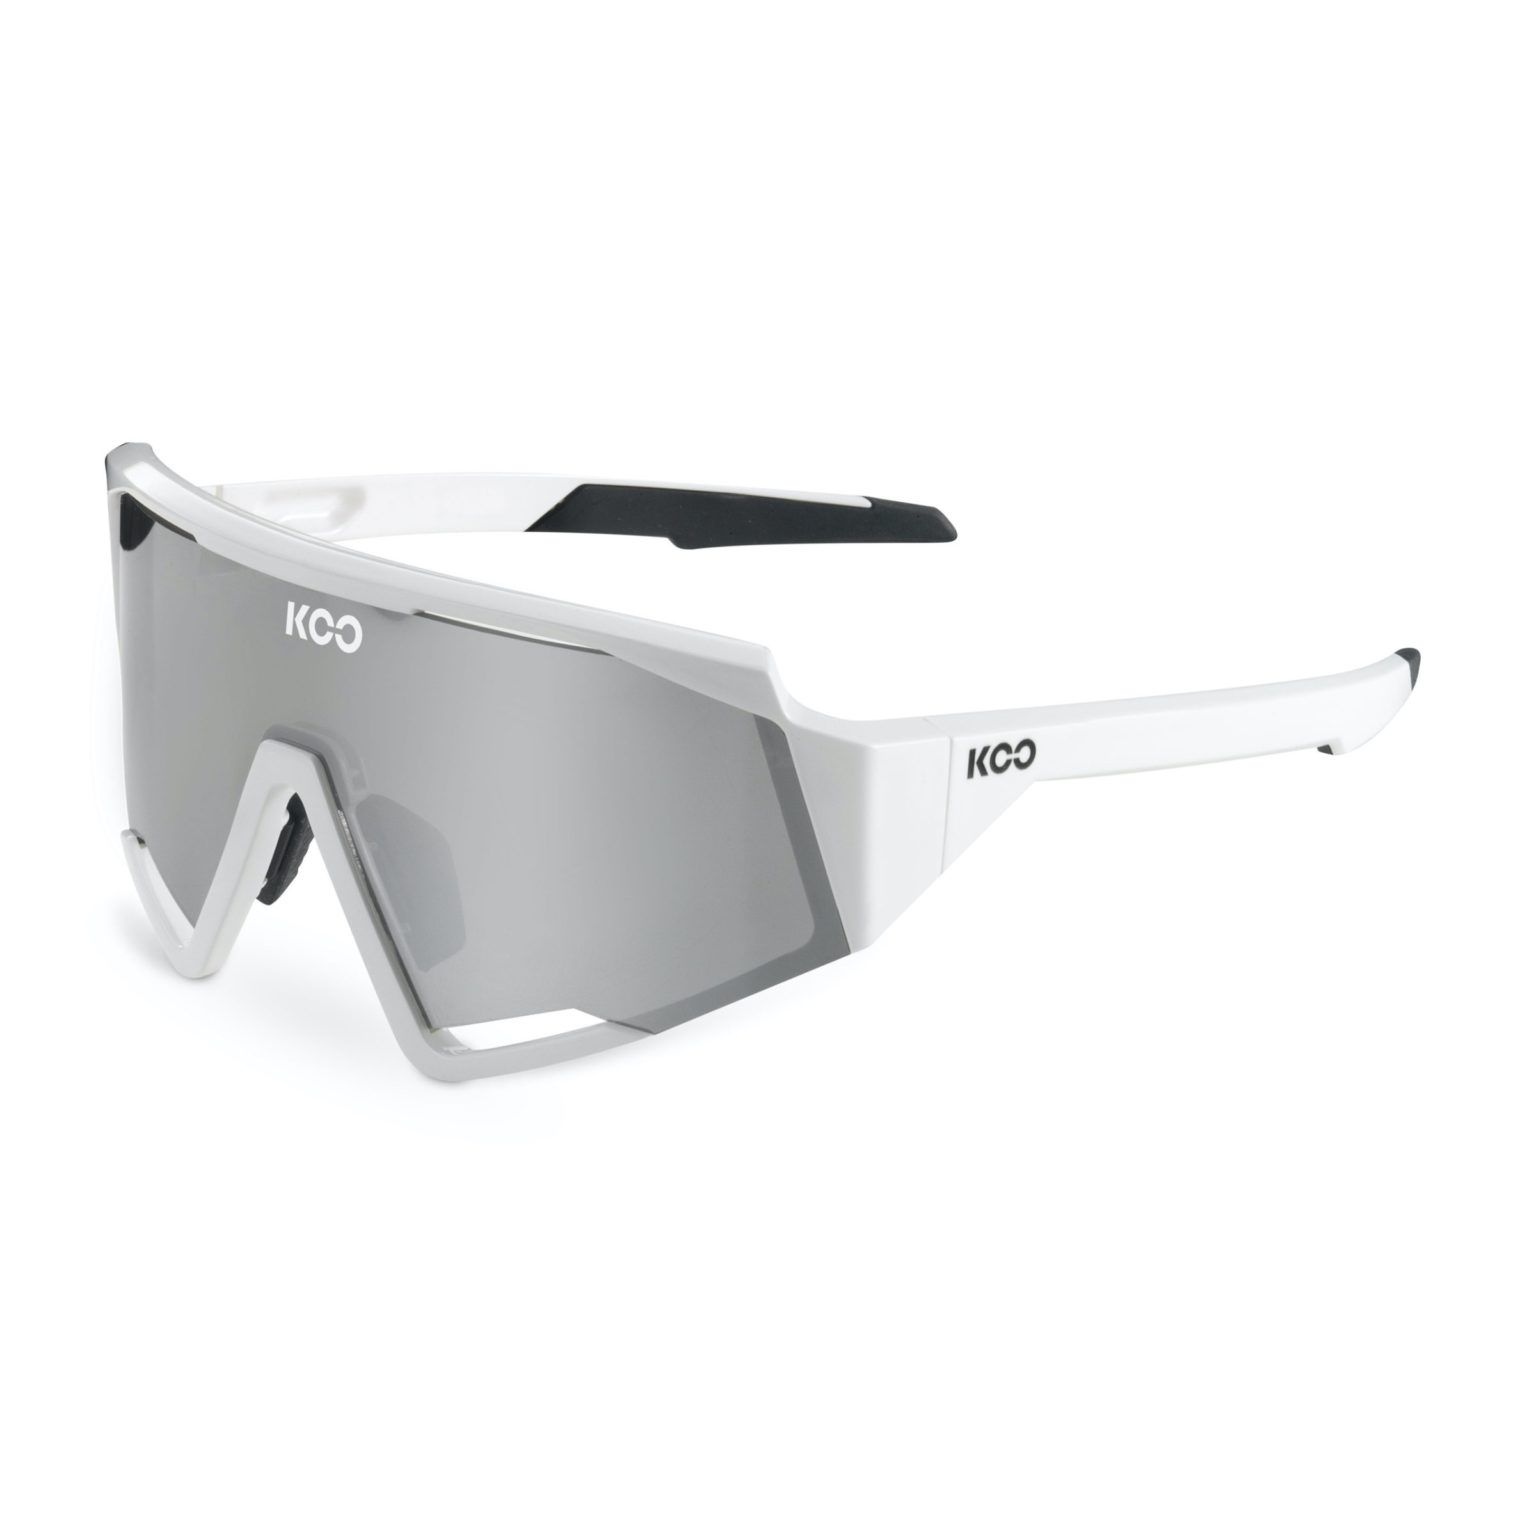 SPECTRO WHITE SILVER 2400x1253 Fotor